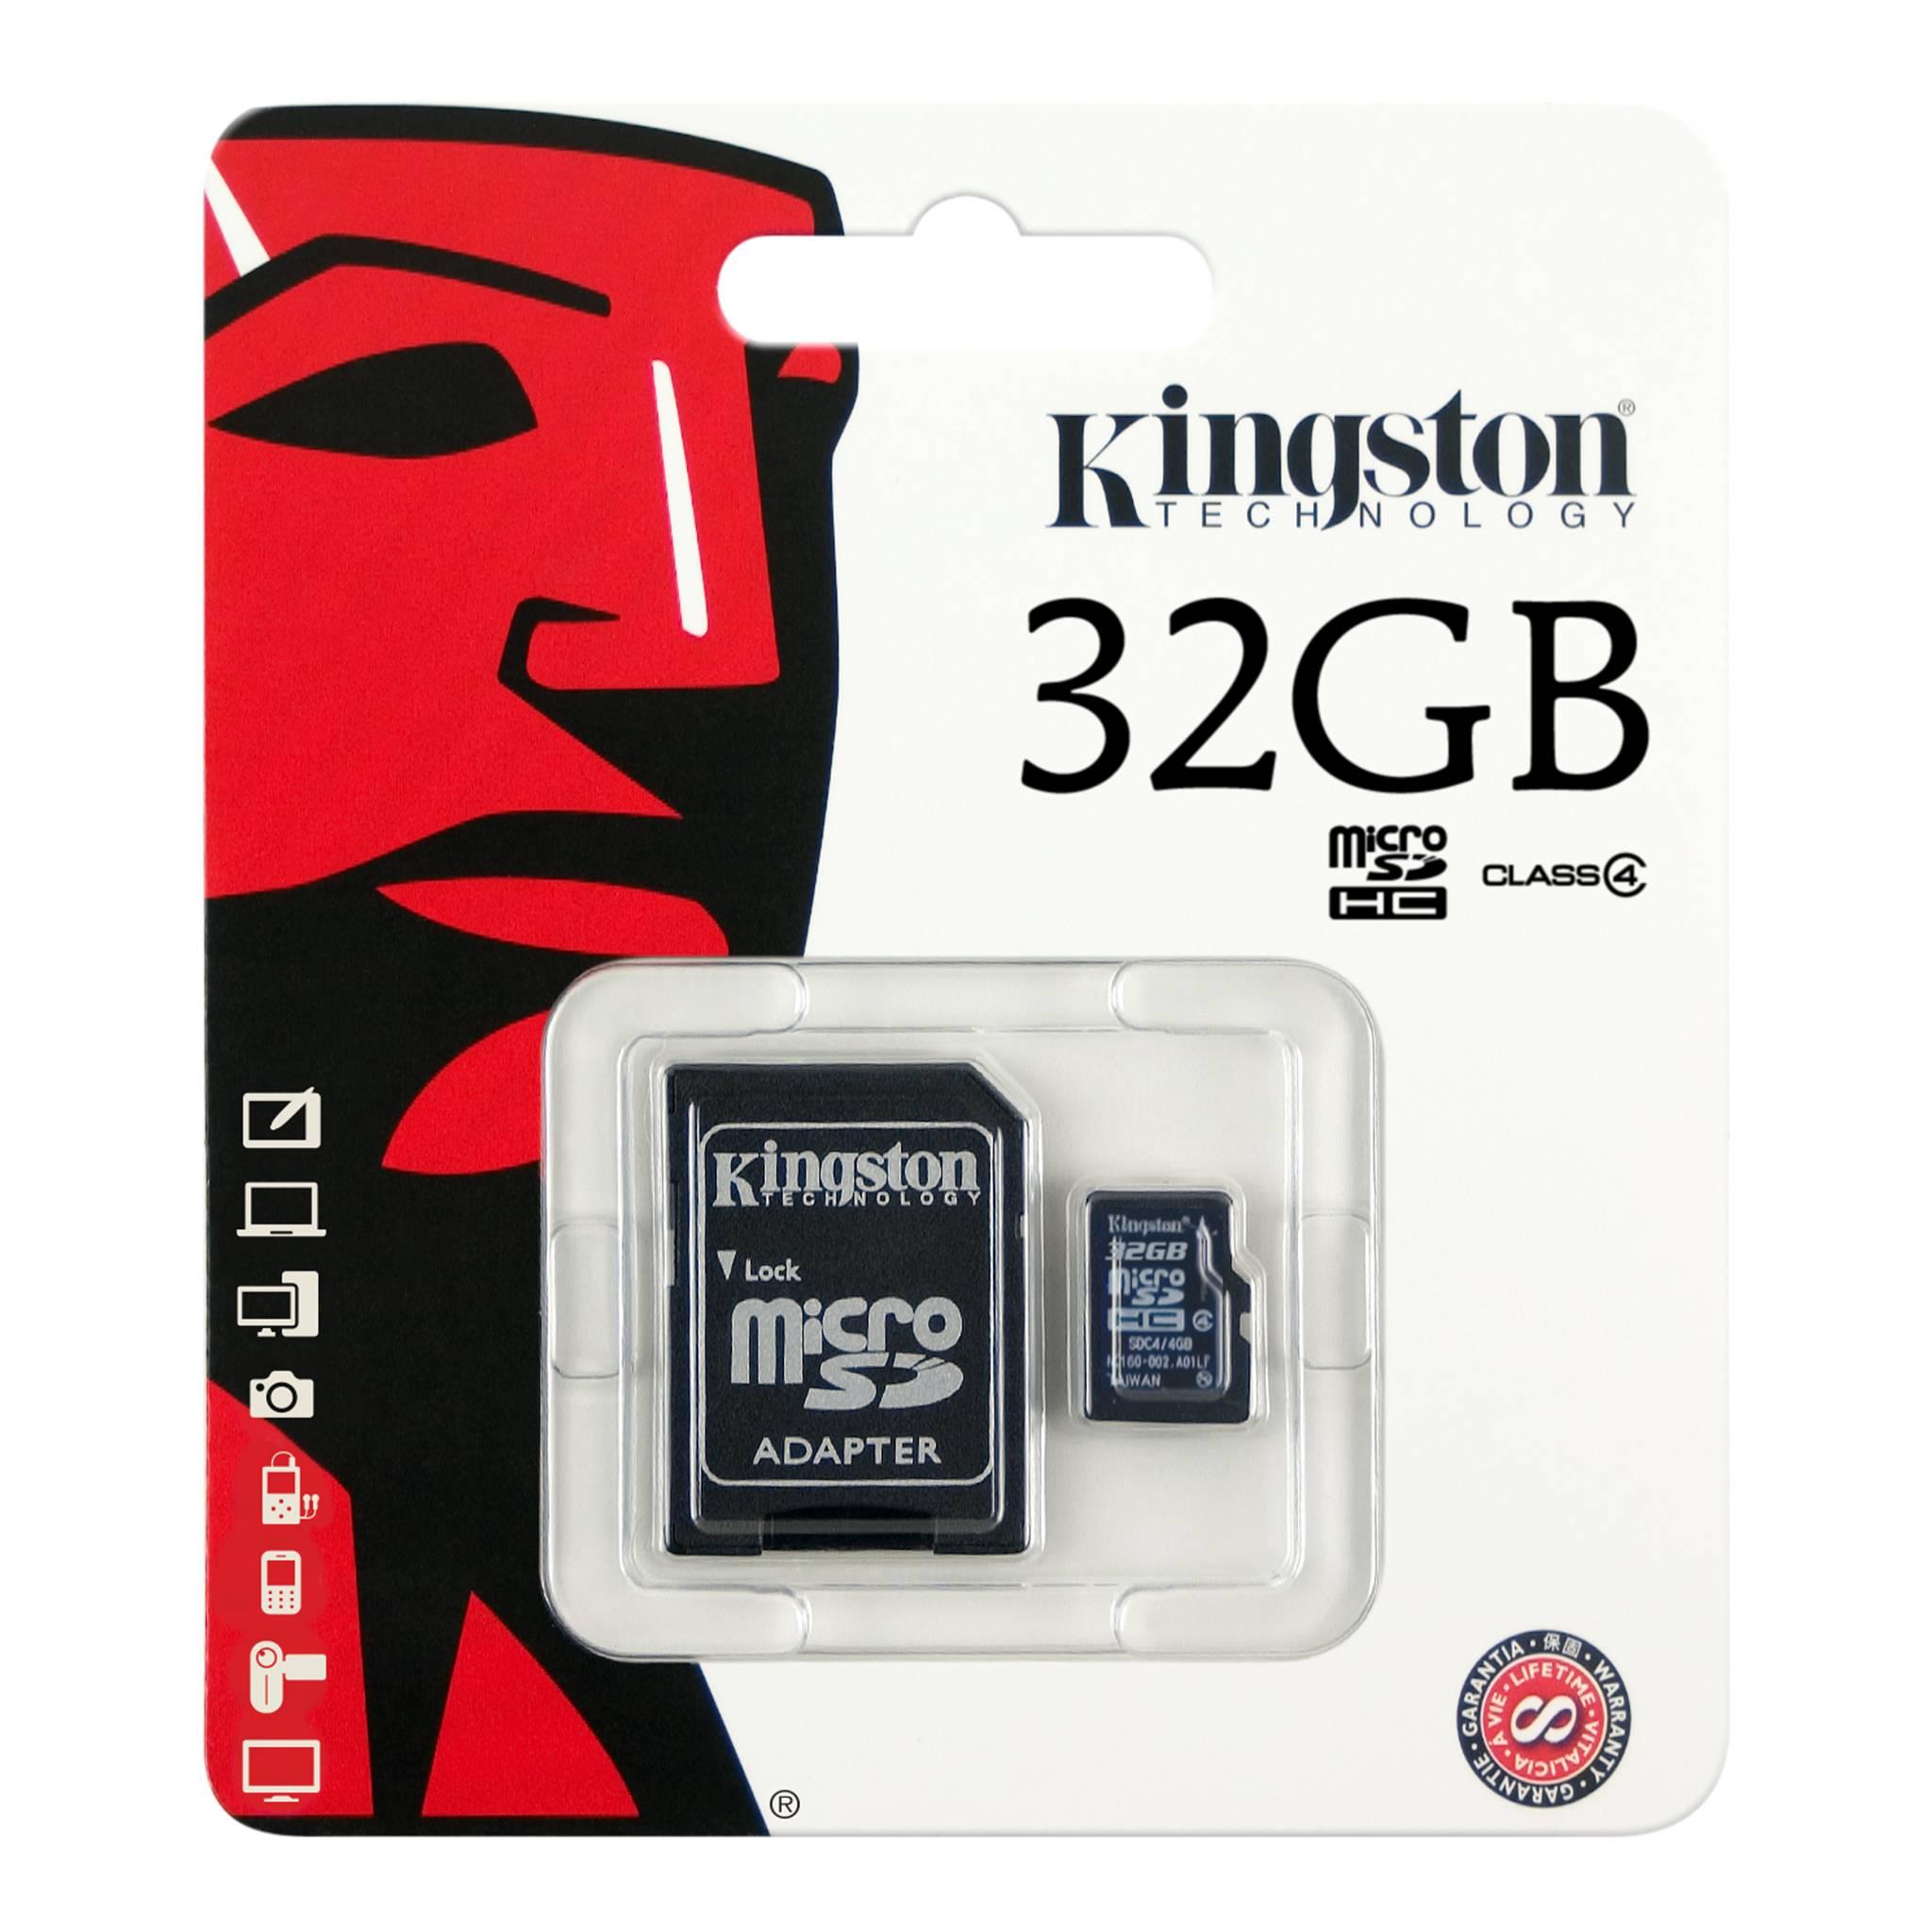 Frisk MicroSDHC Class 4 Card with Optional SD Adaptor OY-92